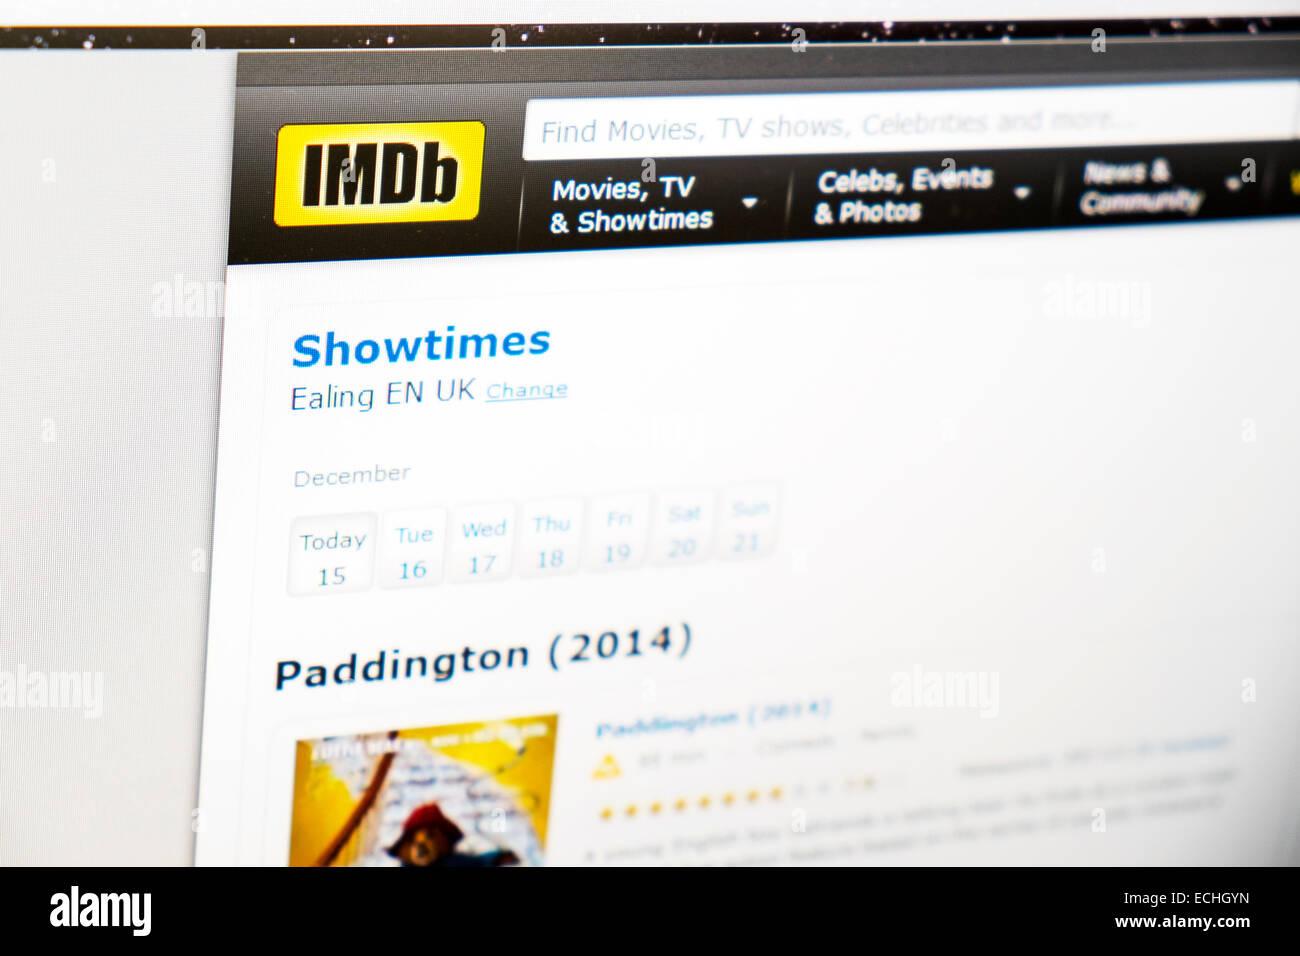 IMDB Internet Datenbank Website Web Filme Computer Bildschirm Kinoprogramm Stockbild